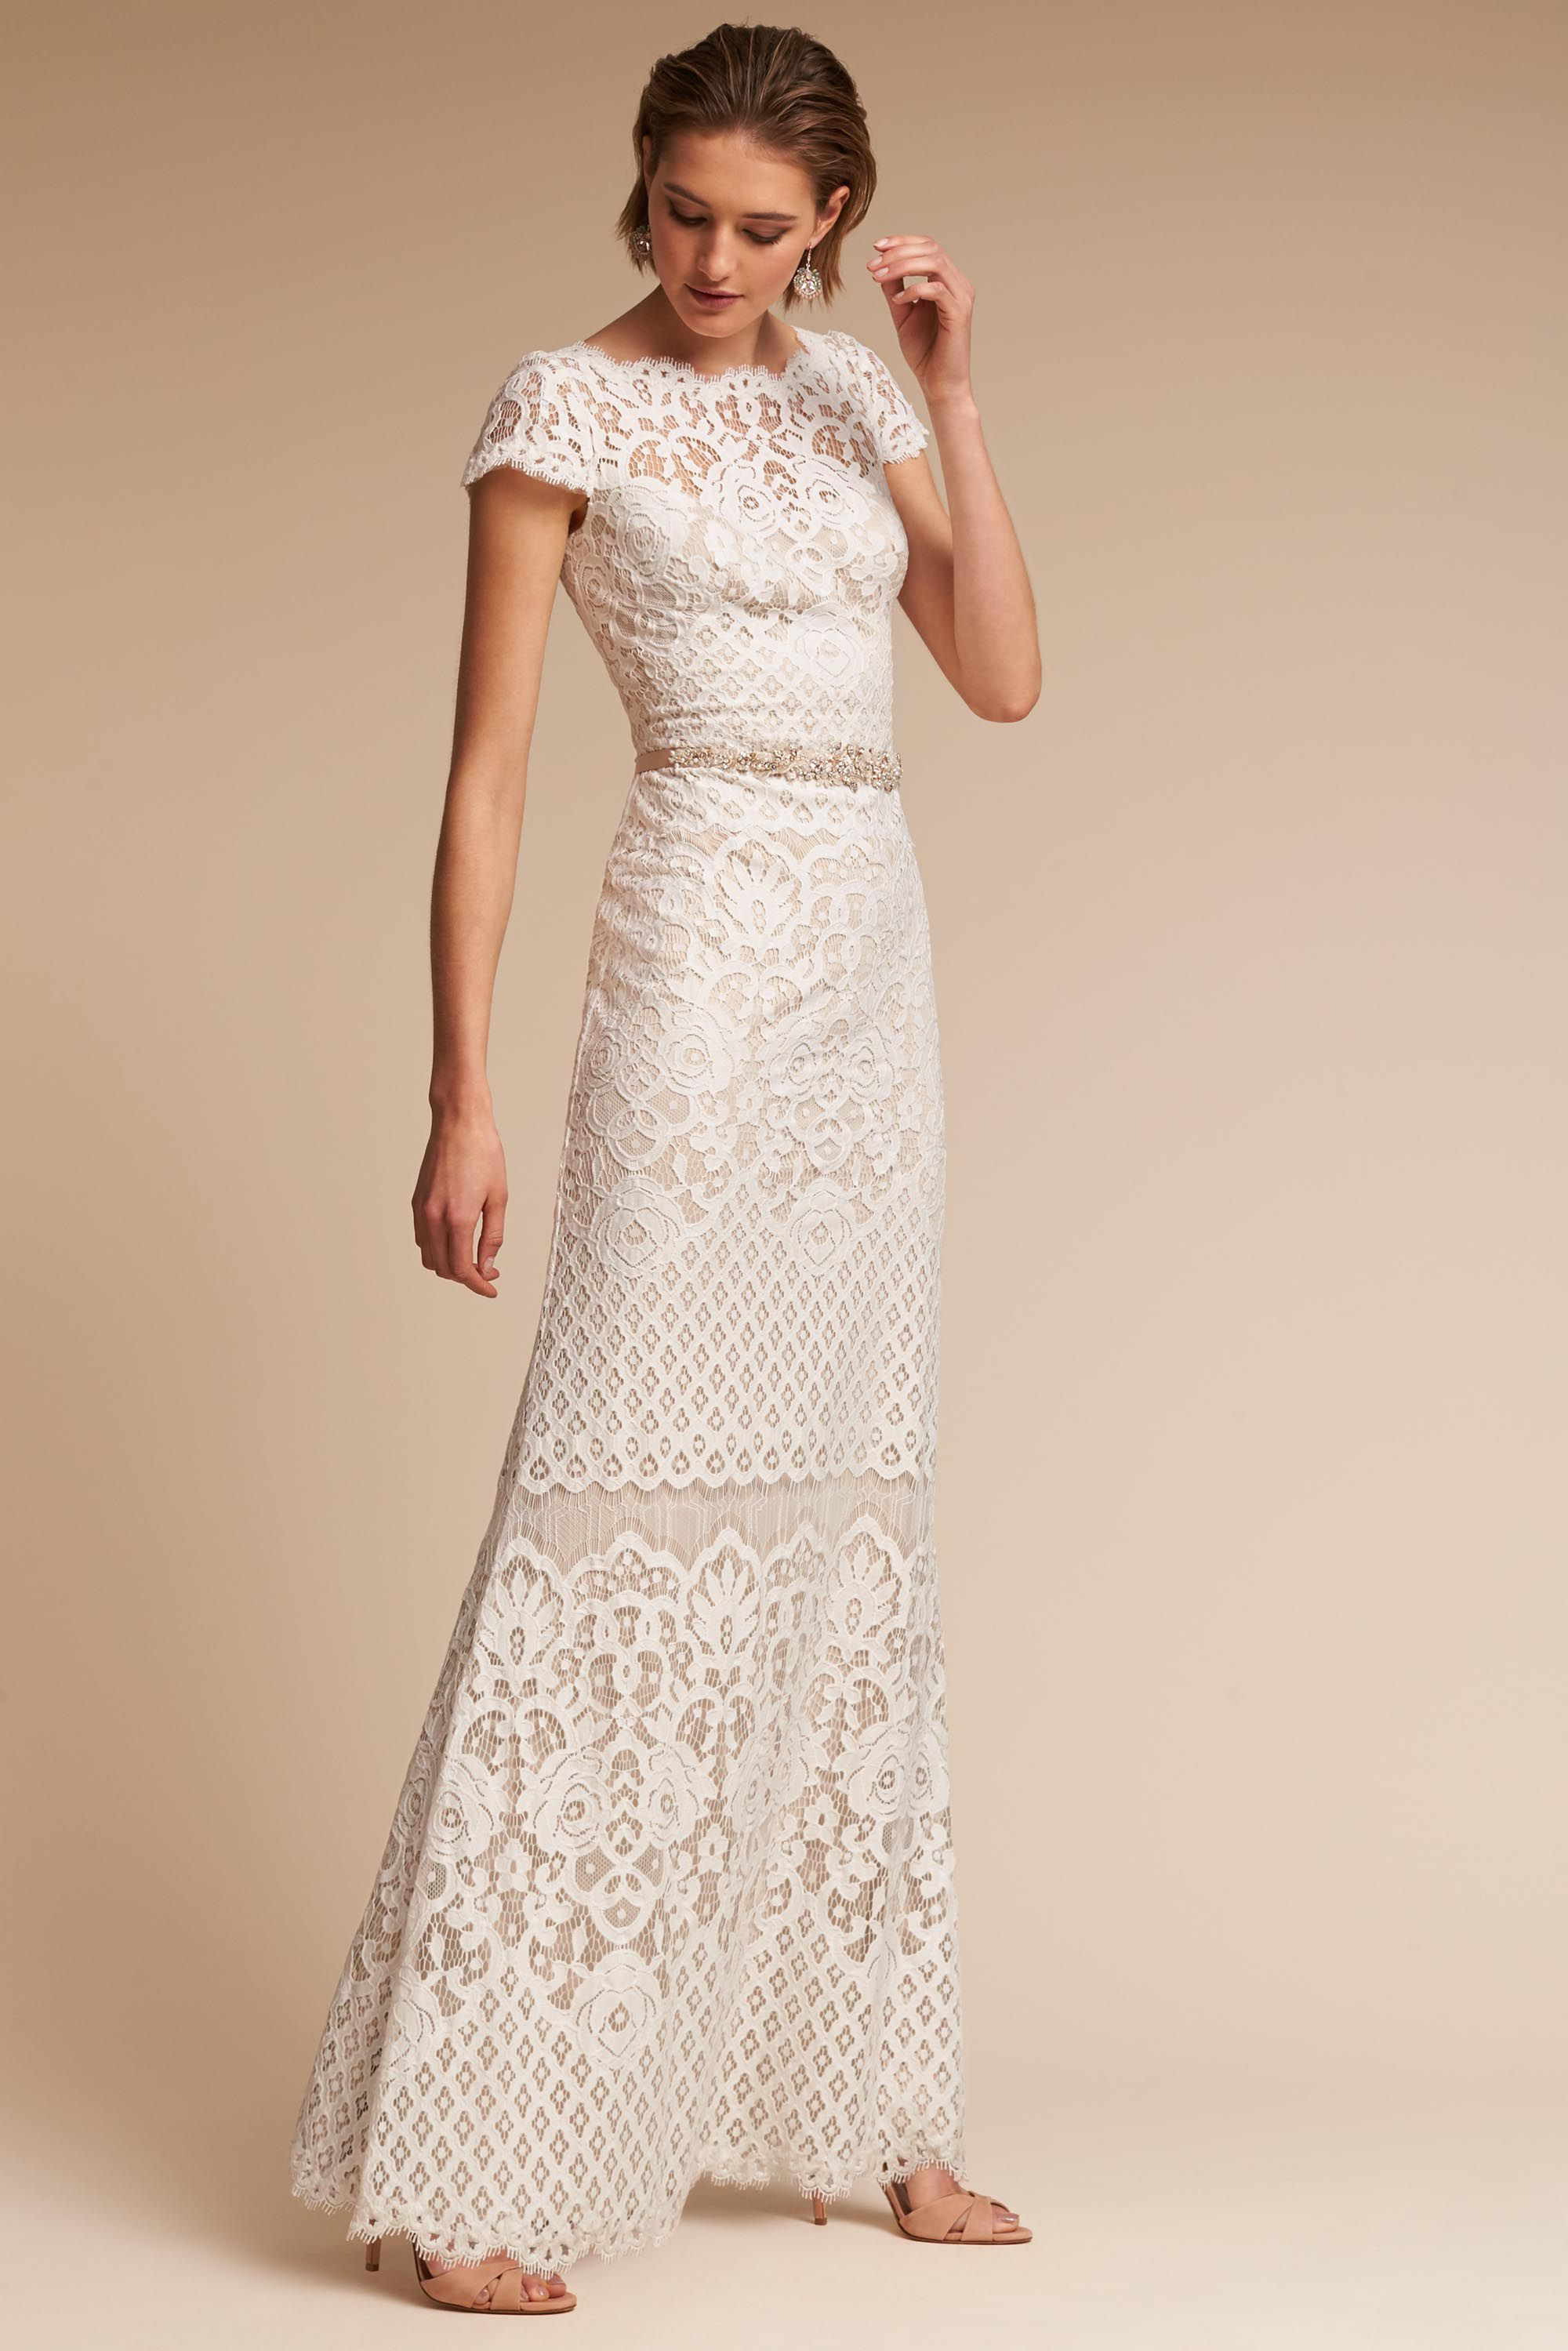 Peridot Gown